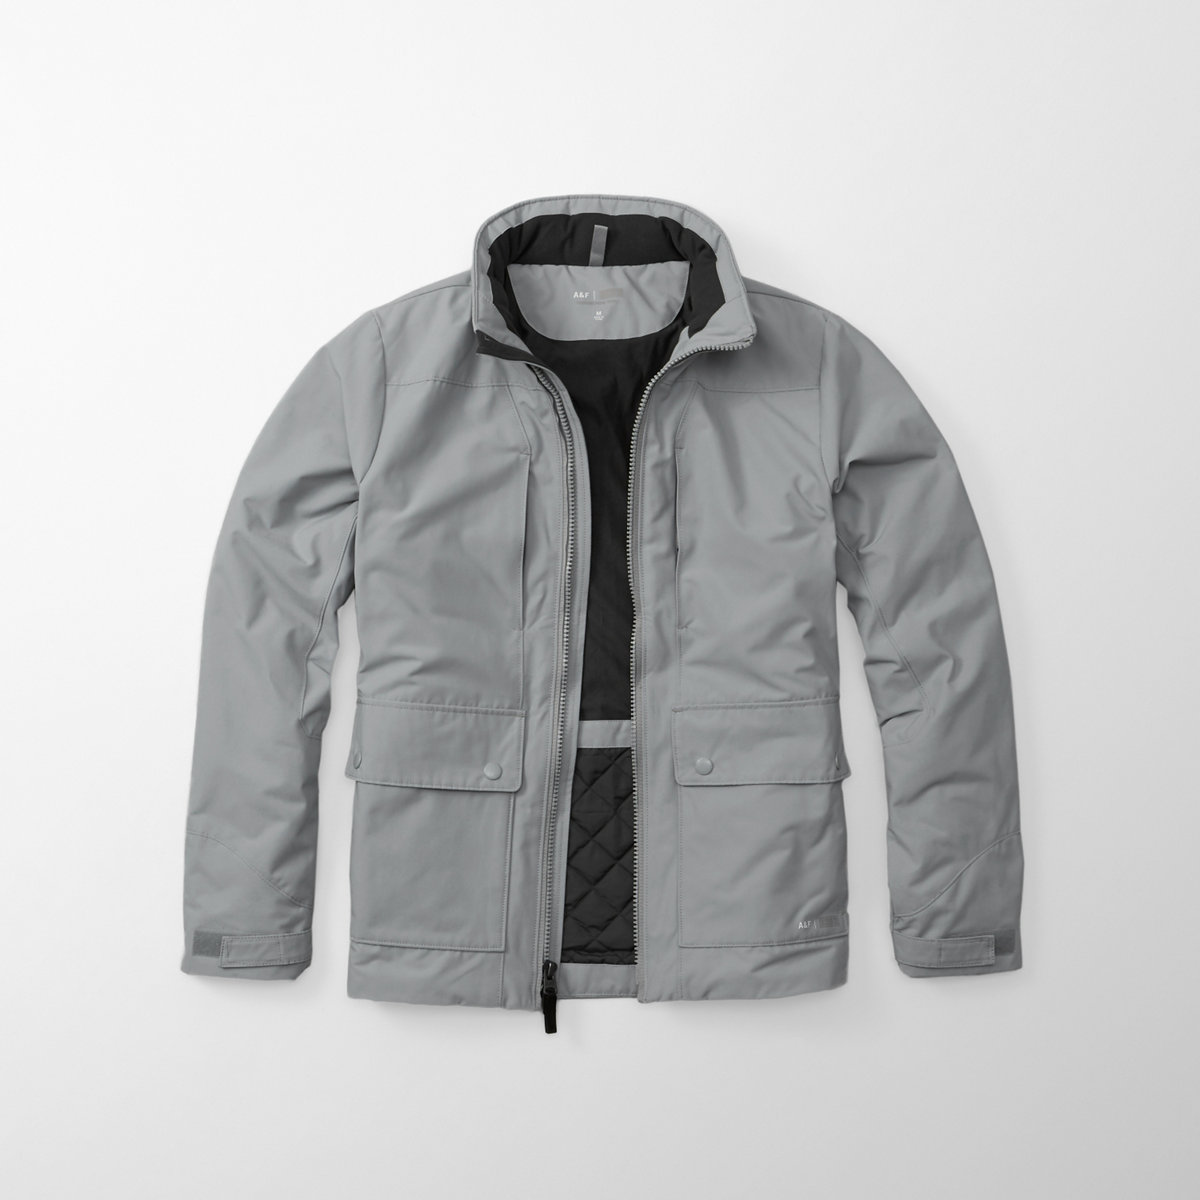 Thermo Peak Jacket